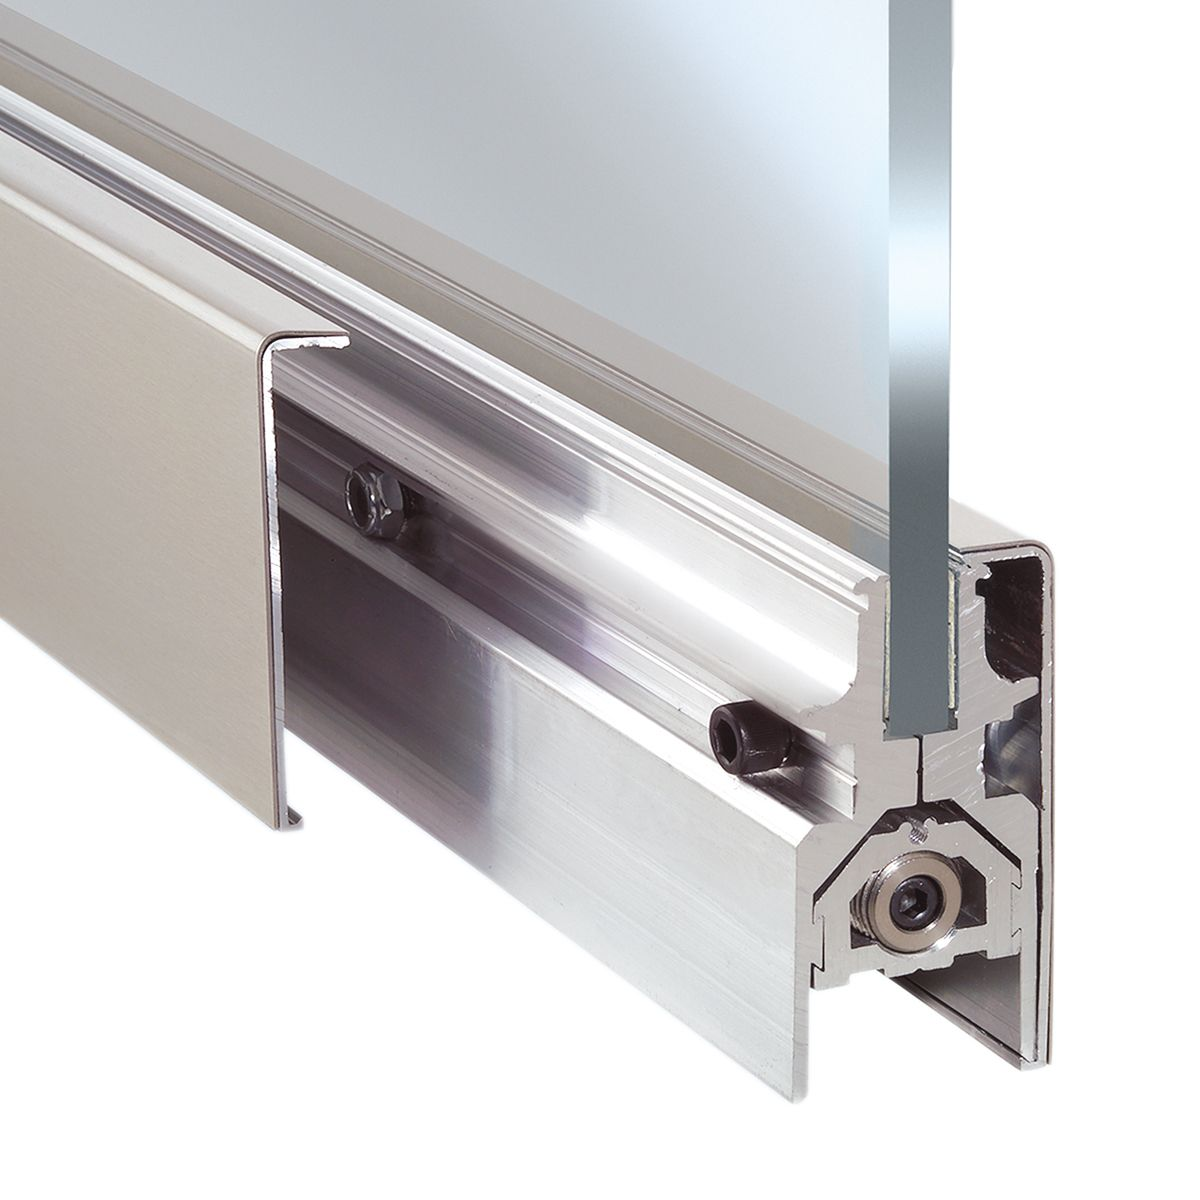 Dorma Drs Rp Dri Fit Rails Headers Glazing Systems